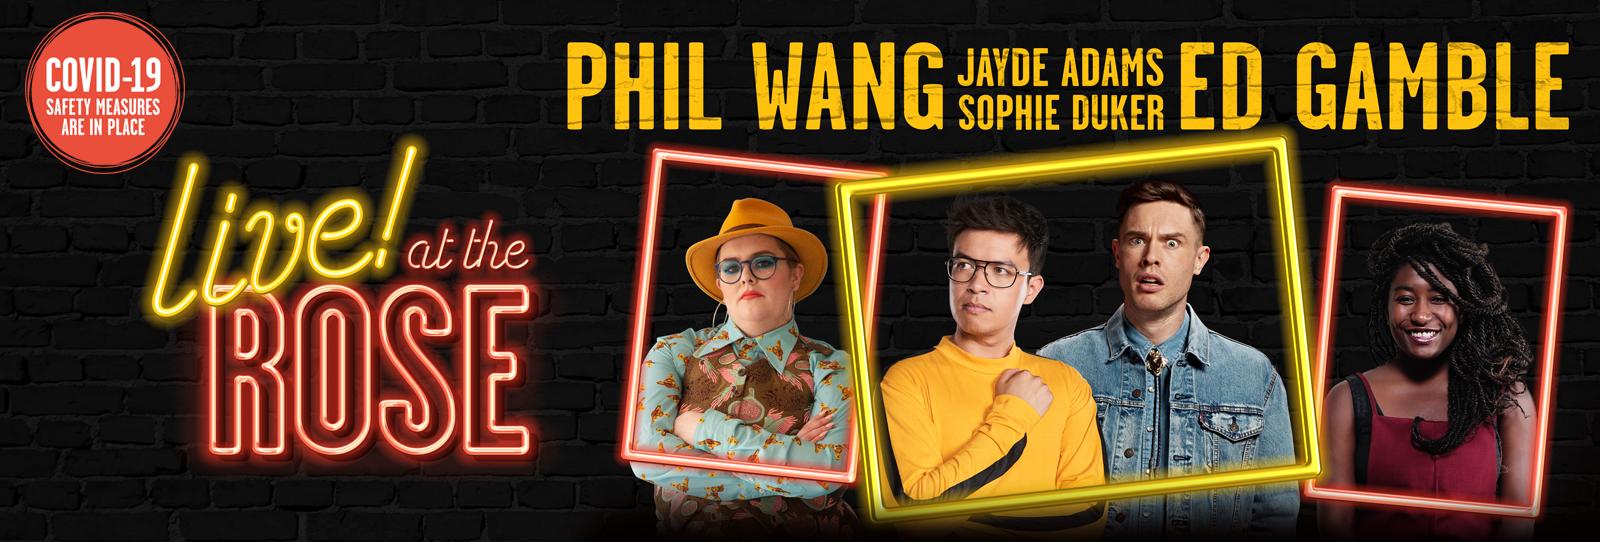 Live at the Rose -  With Phil Wang & Ed Gamble